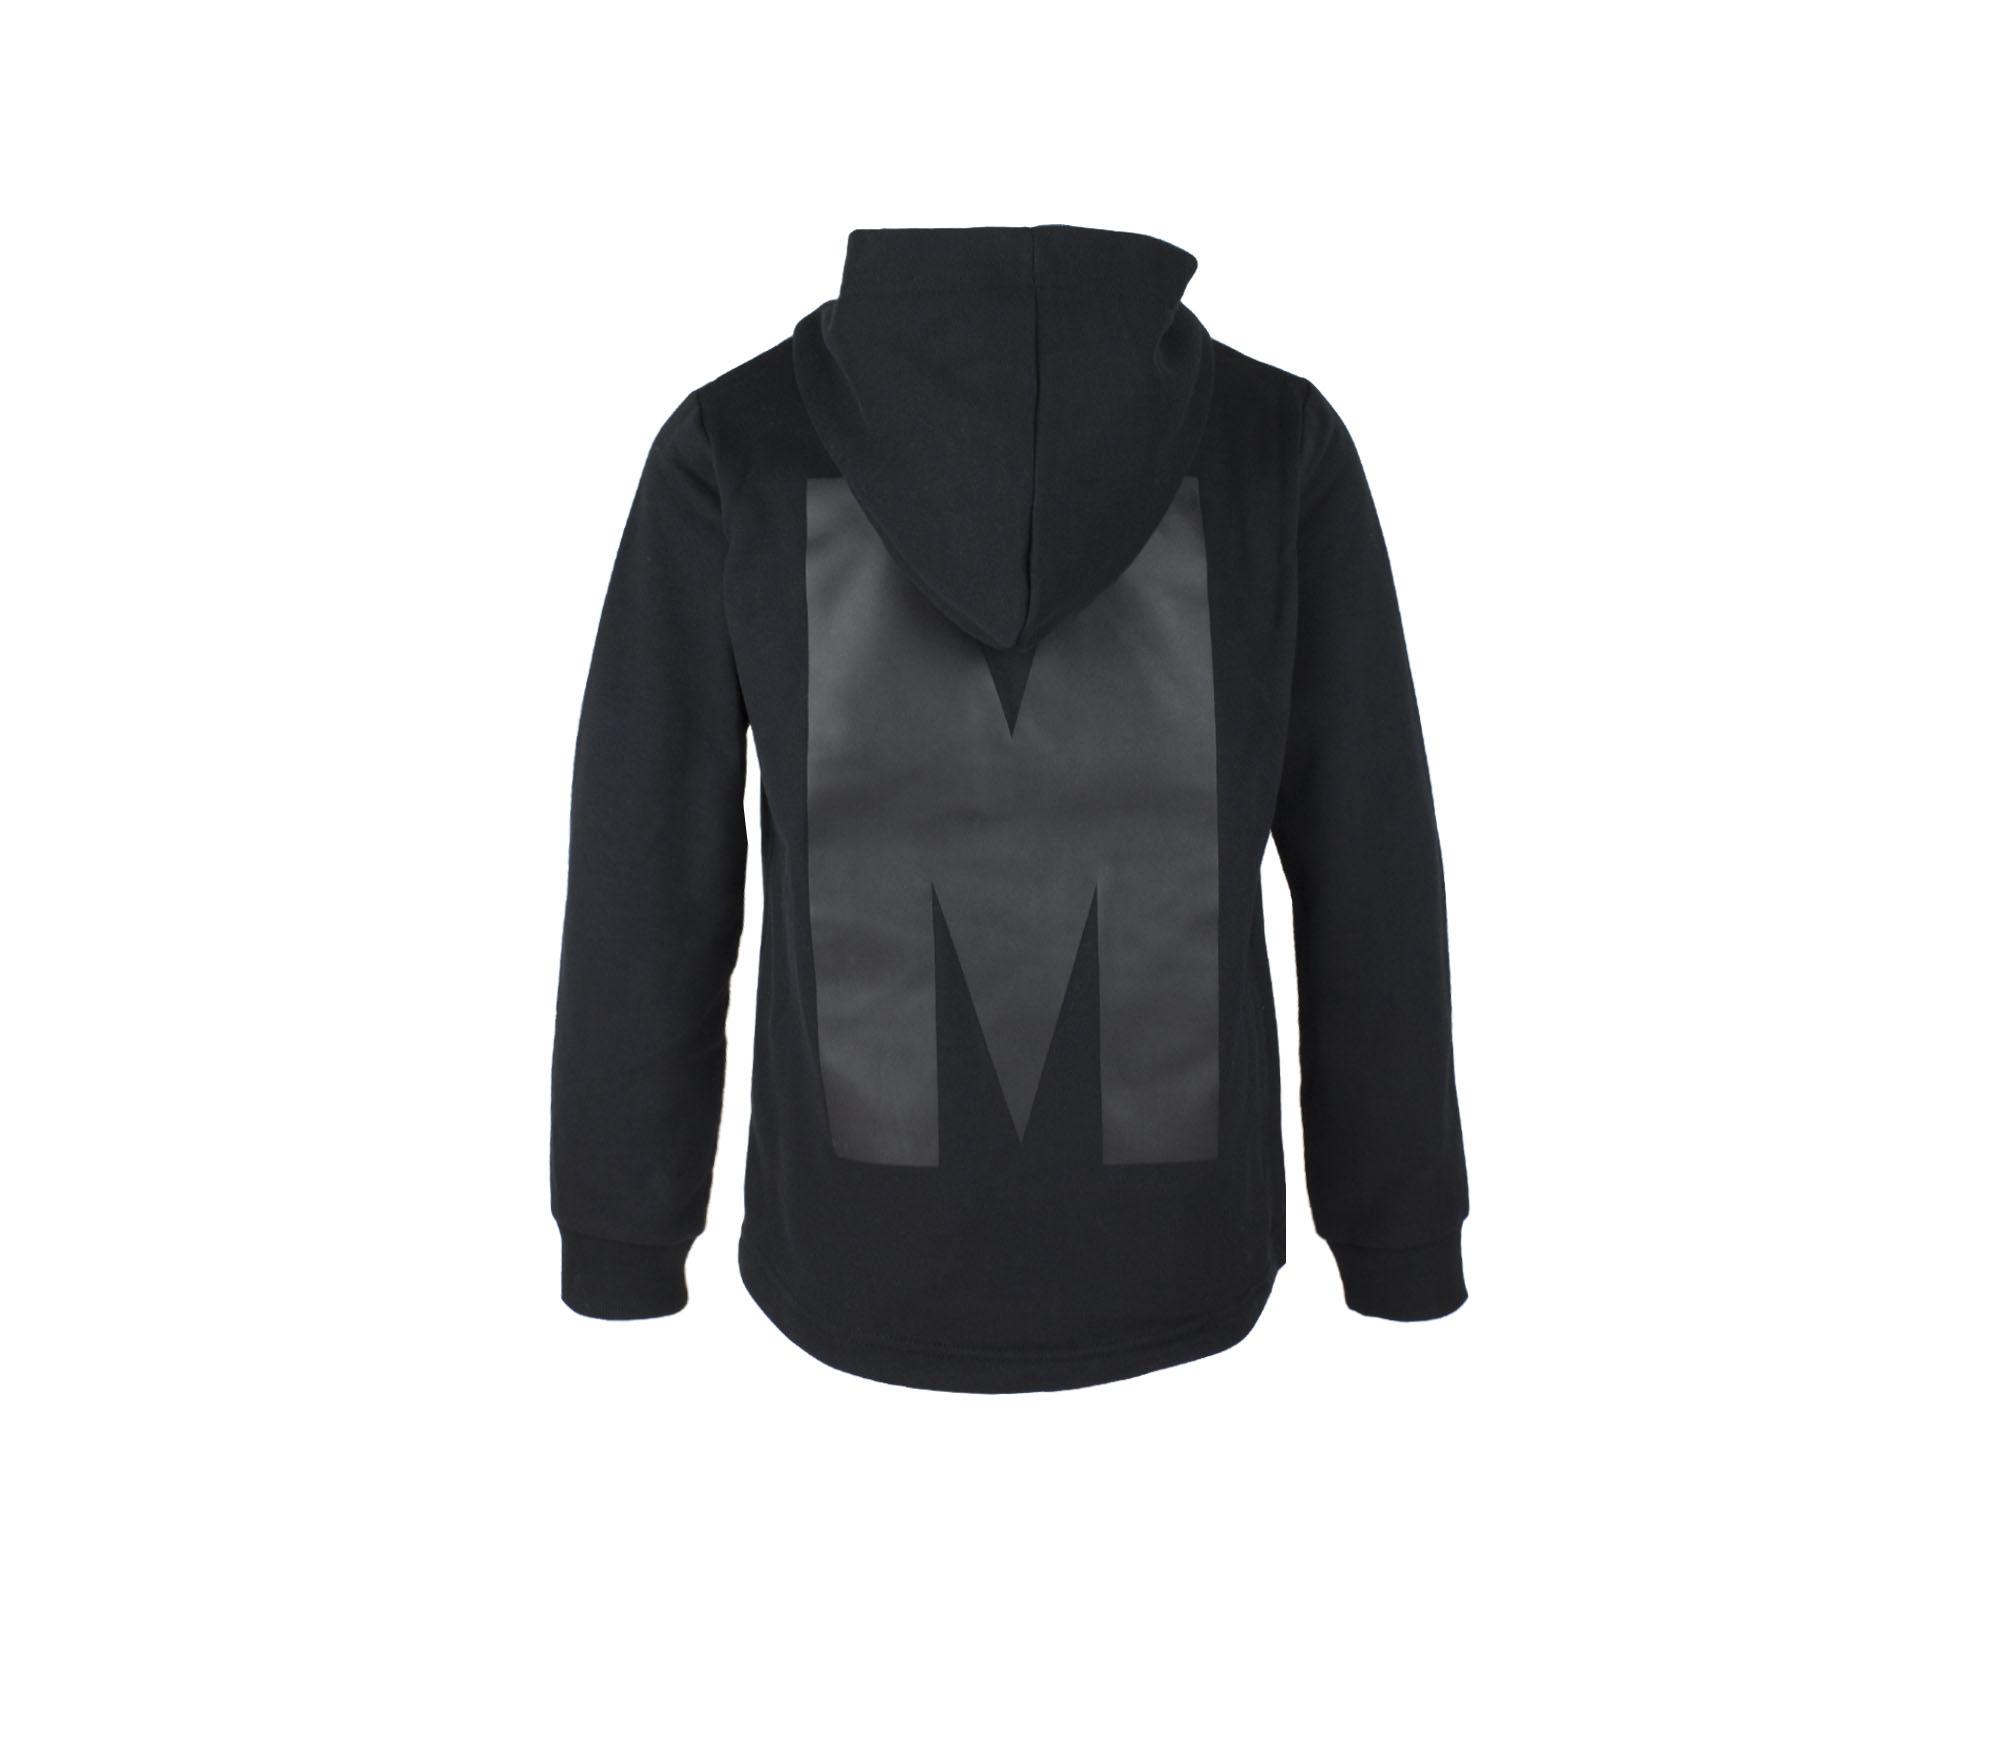 Sweatshirt hood svart – Nixon